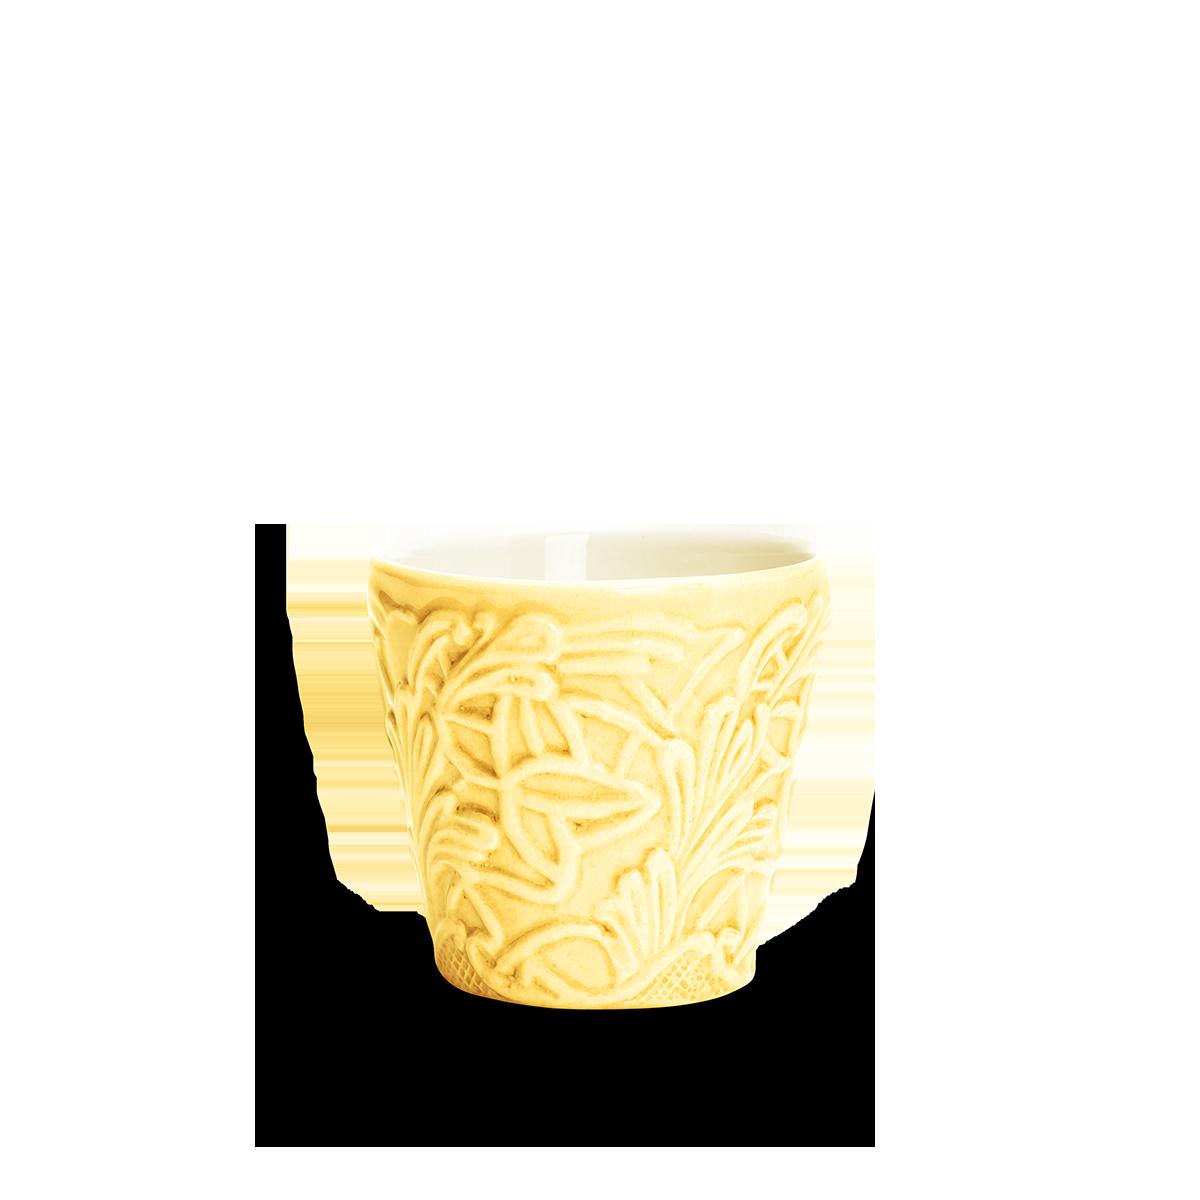 Spets Espressokopp Gul 10 cl